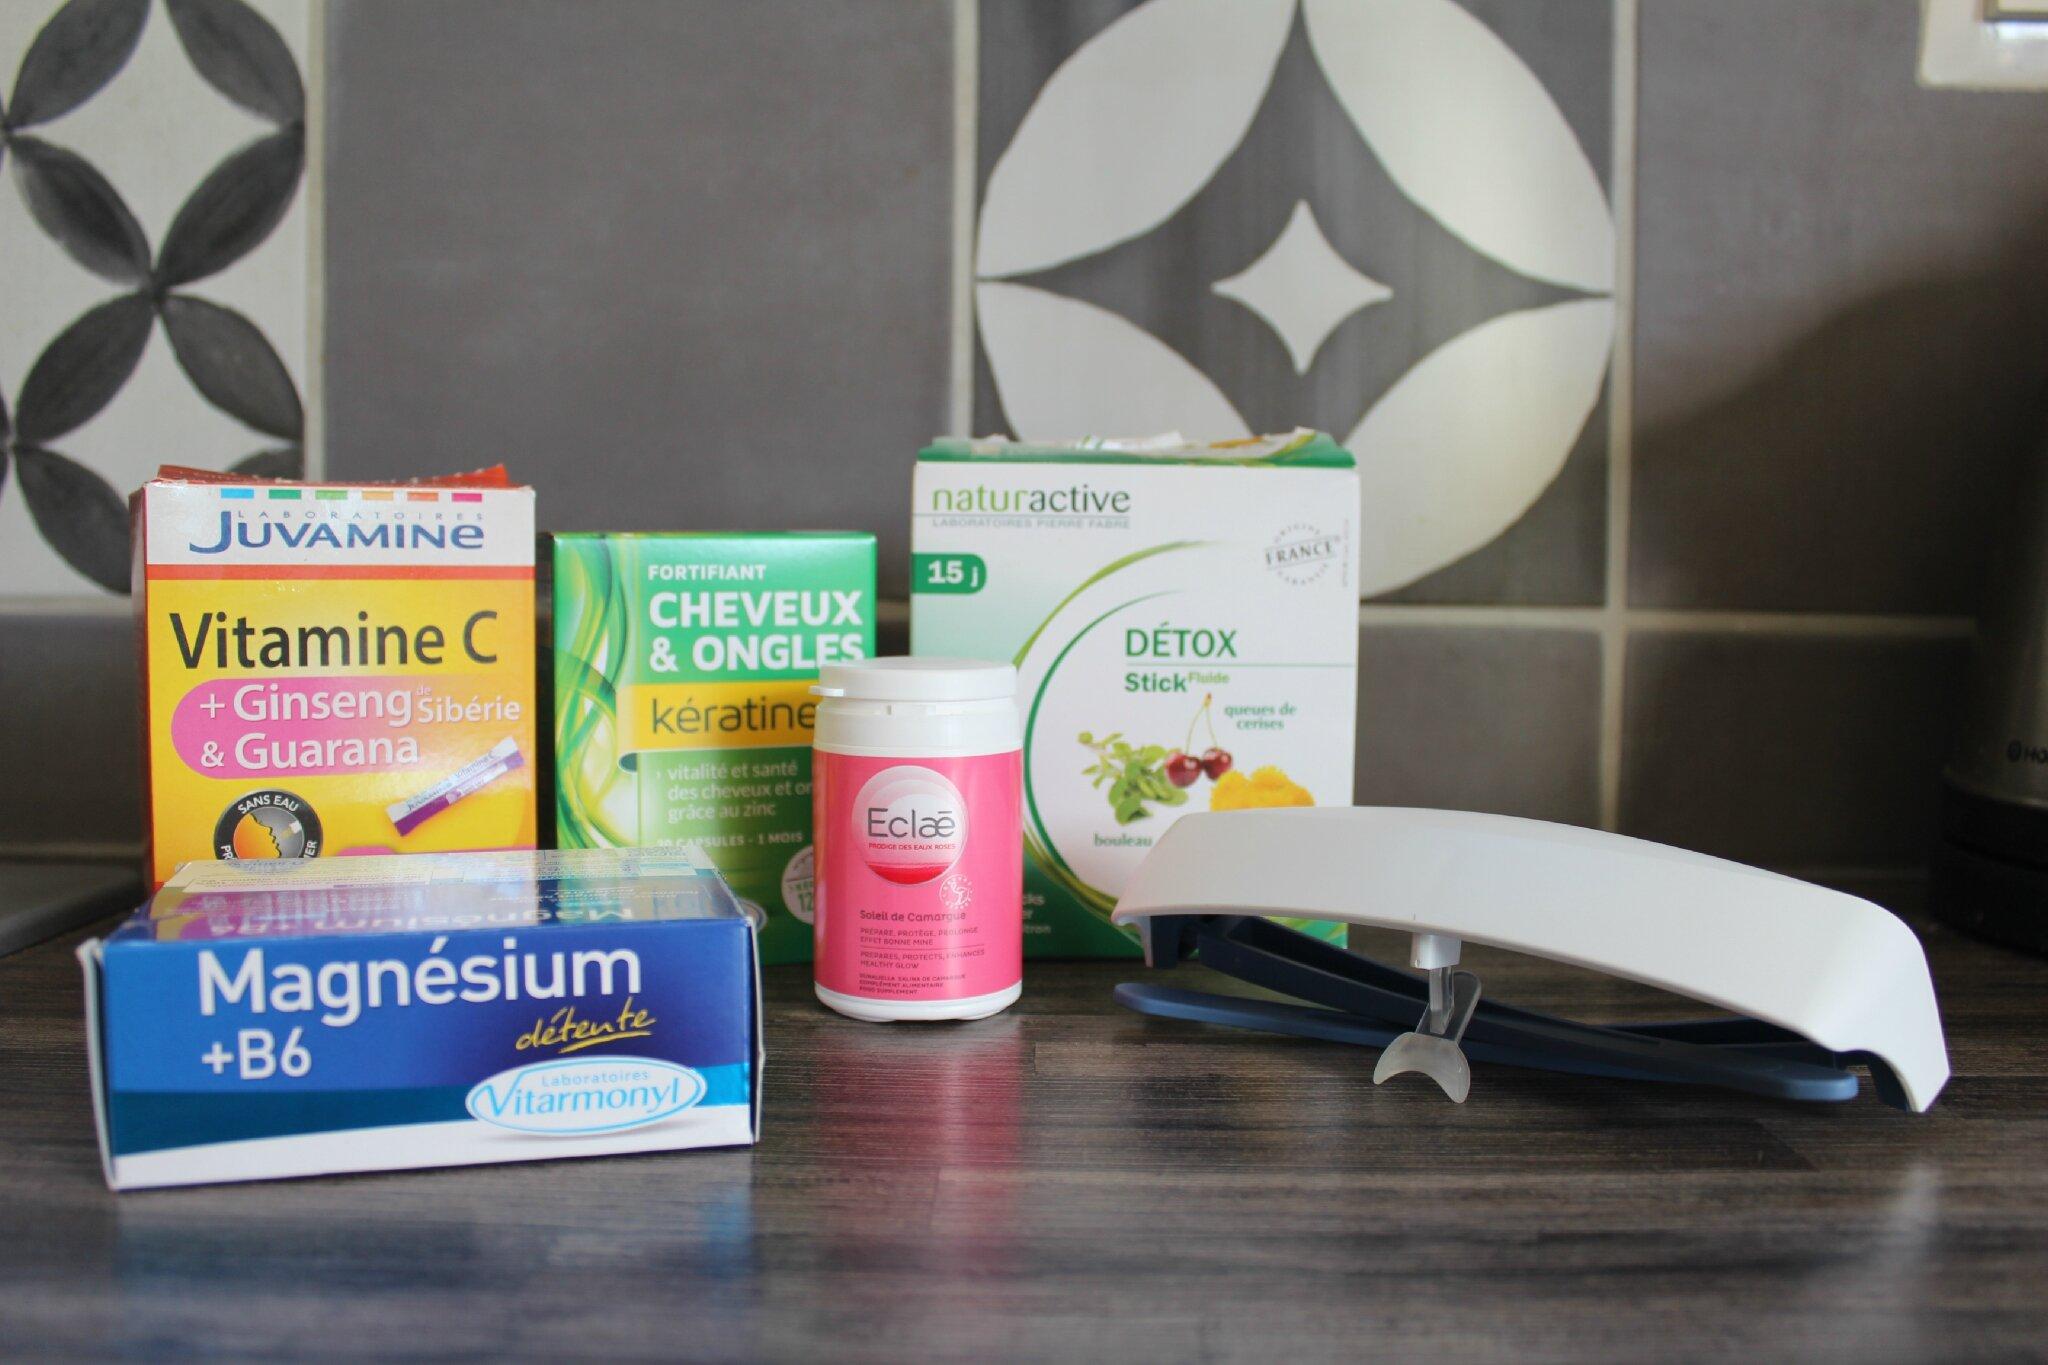 Mon plan vitaminé avant l'hiver (Vitarmonyl, Juvamine, Naturactive, Luminette, Eclae)